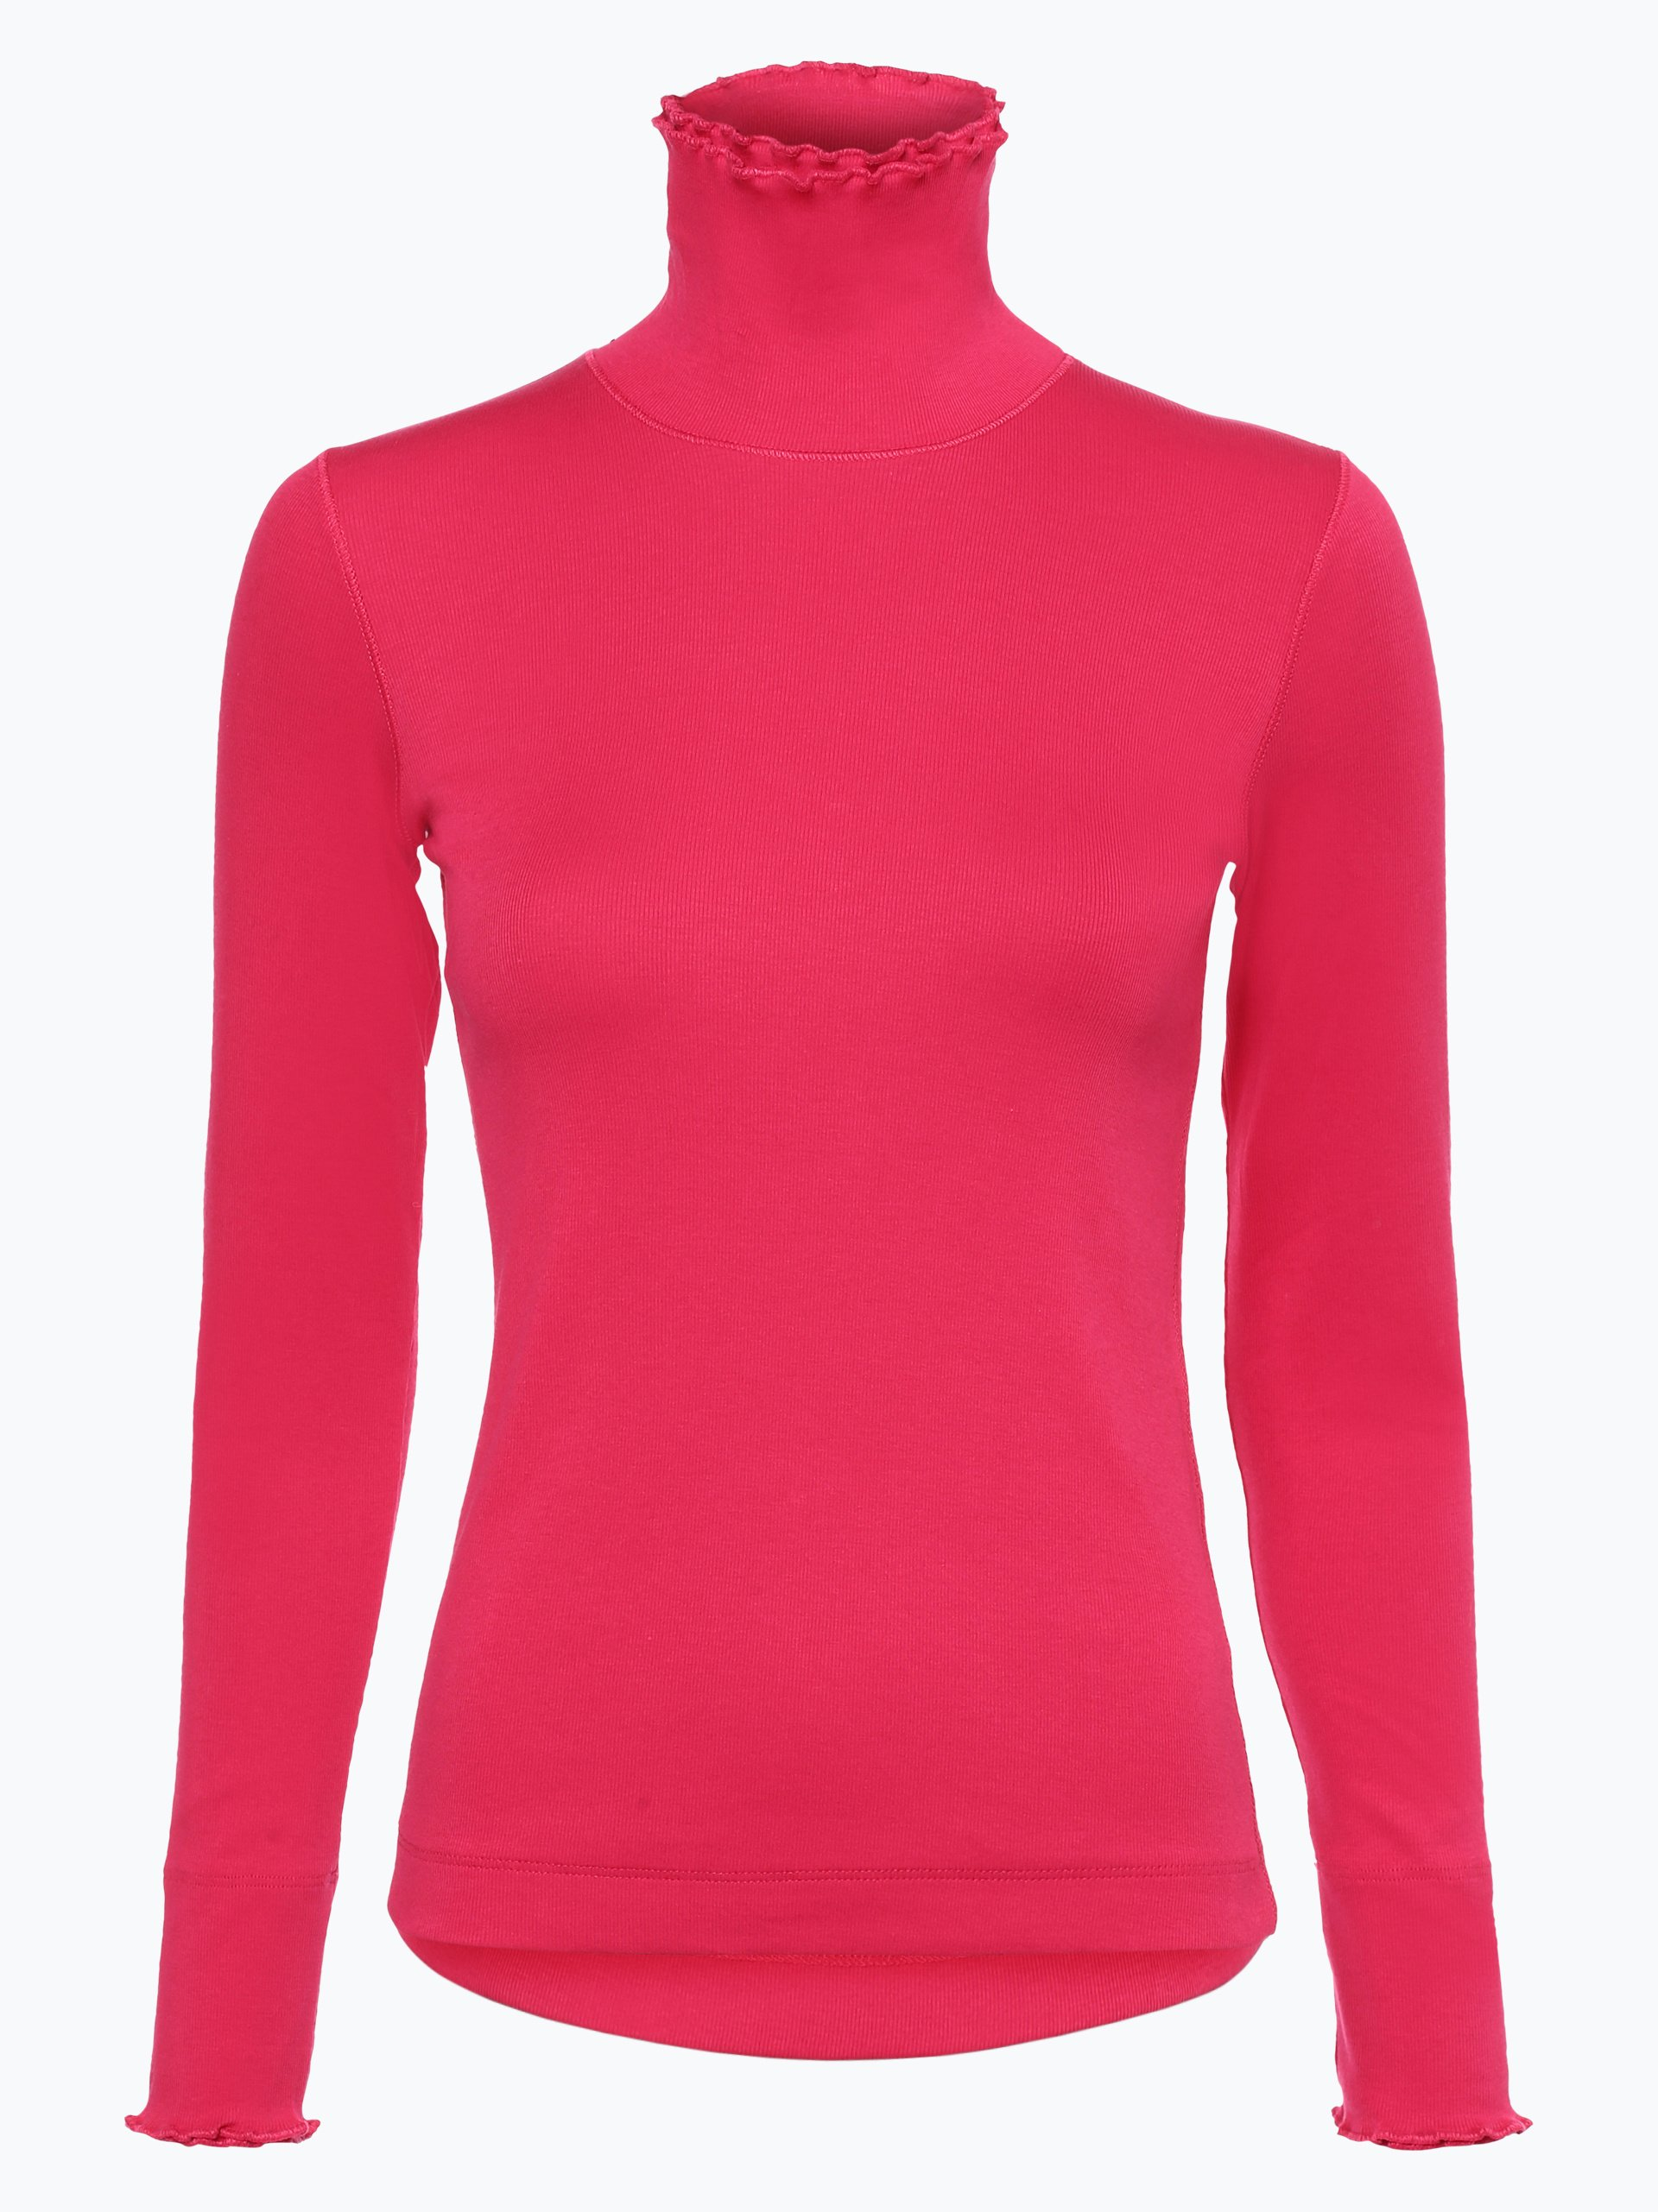 marc cain sports damen langarmshirt pink uni online kaufen peek und cloppenburg de. Black Bedroom Furniture Sets. Home Design Ideas